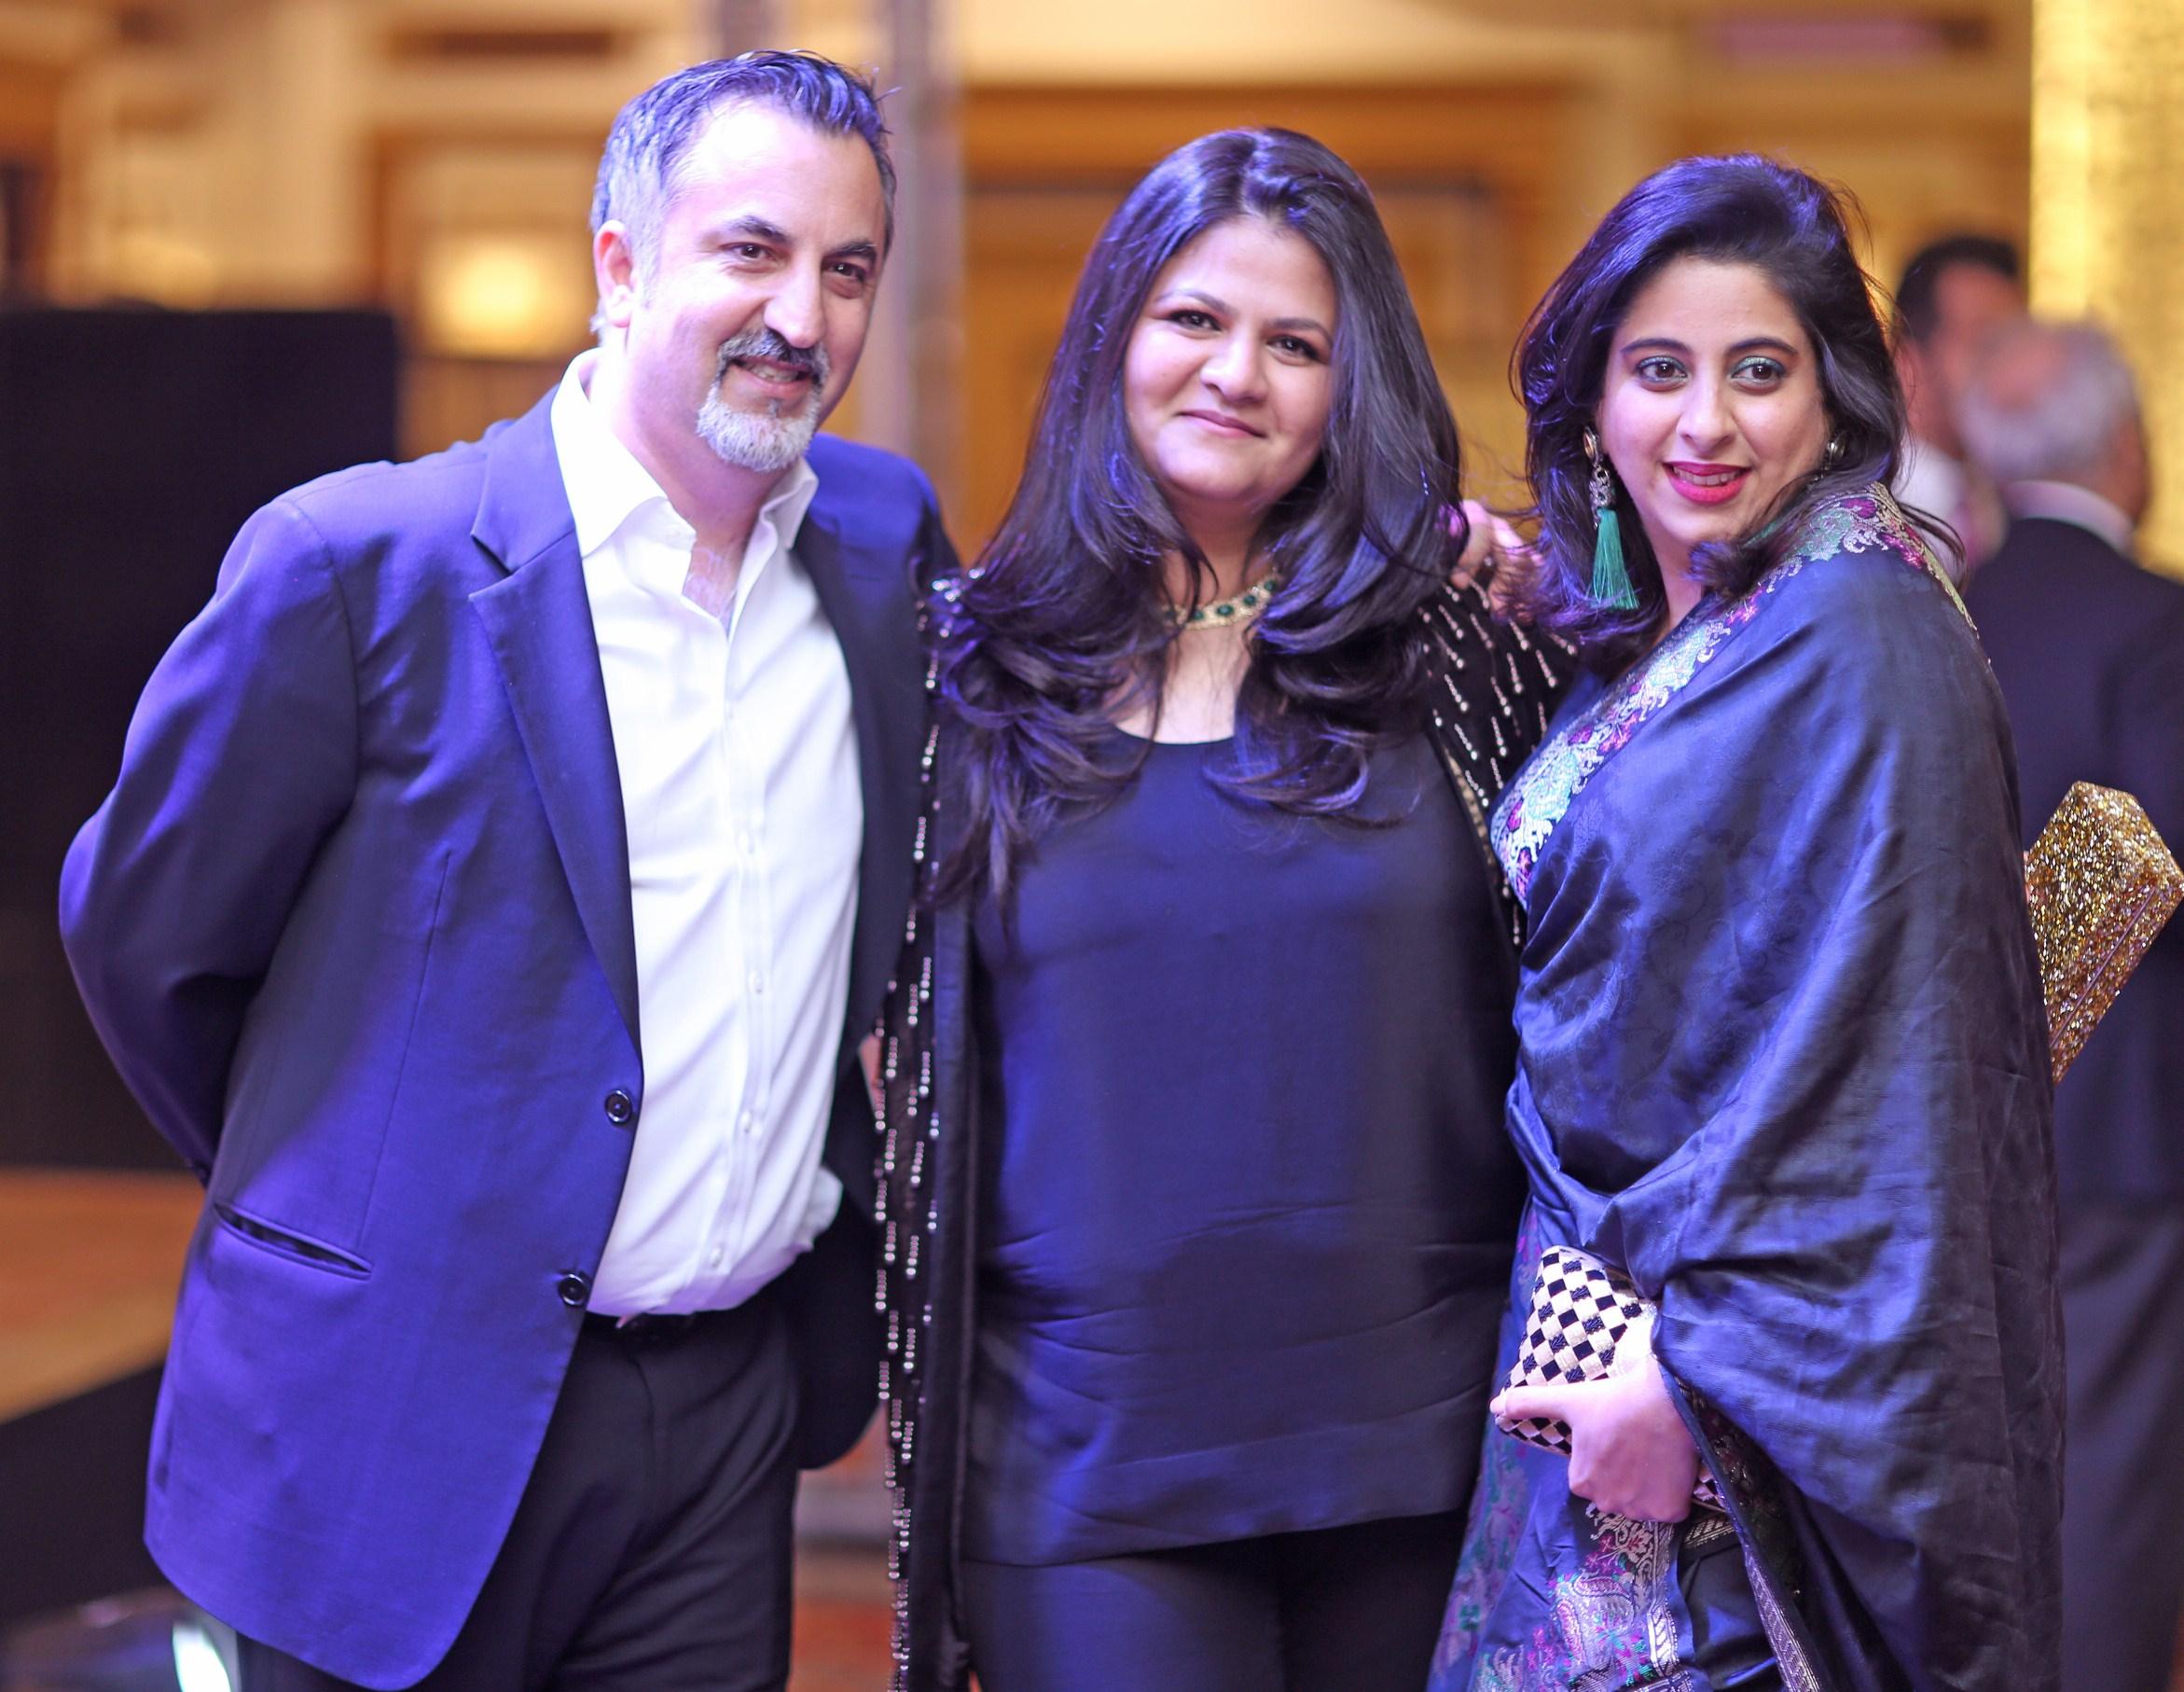 Masood Afridi, Sumeriah Hashwani, Nadia